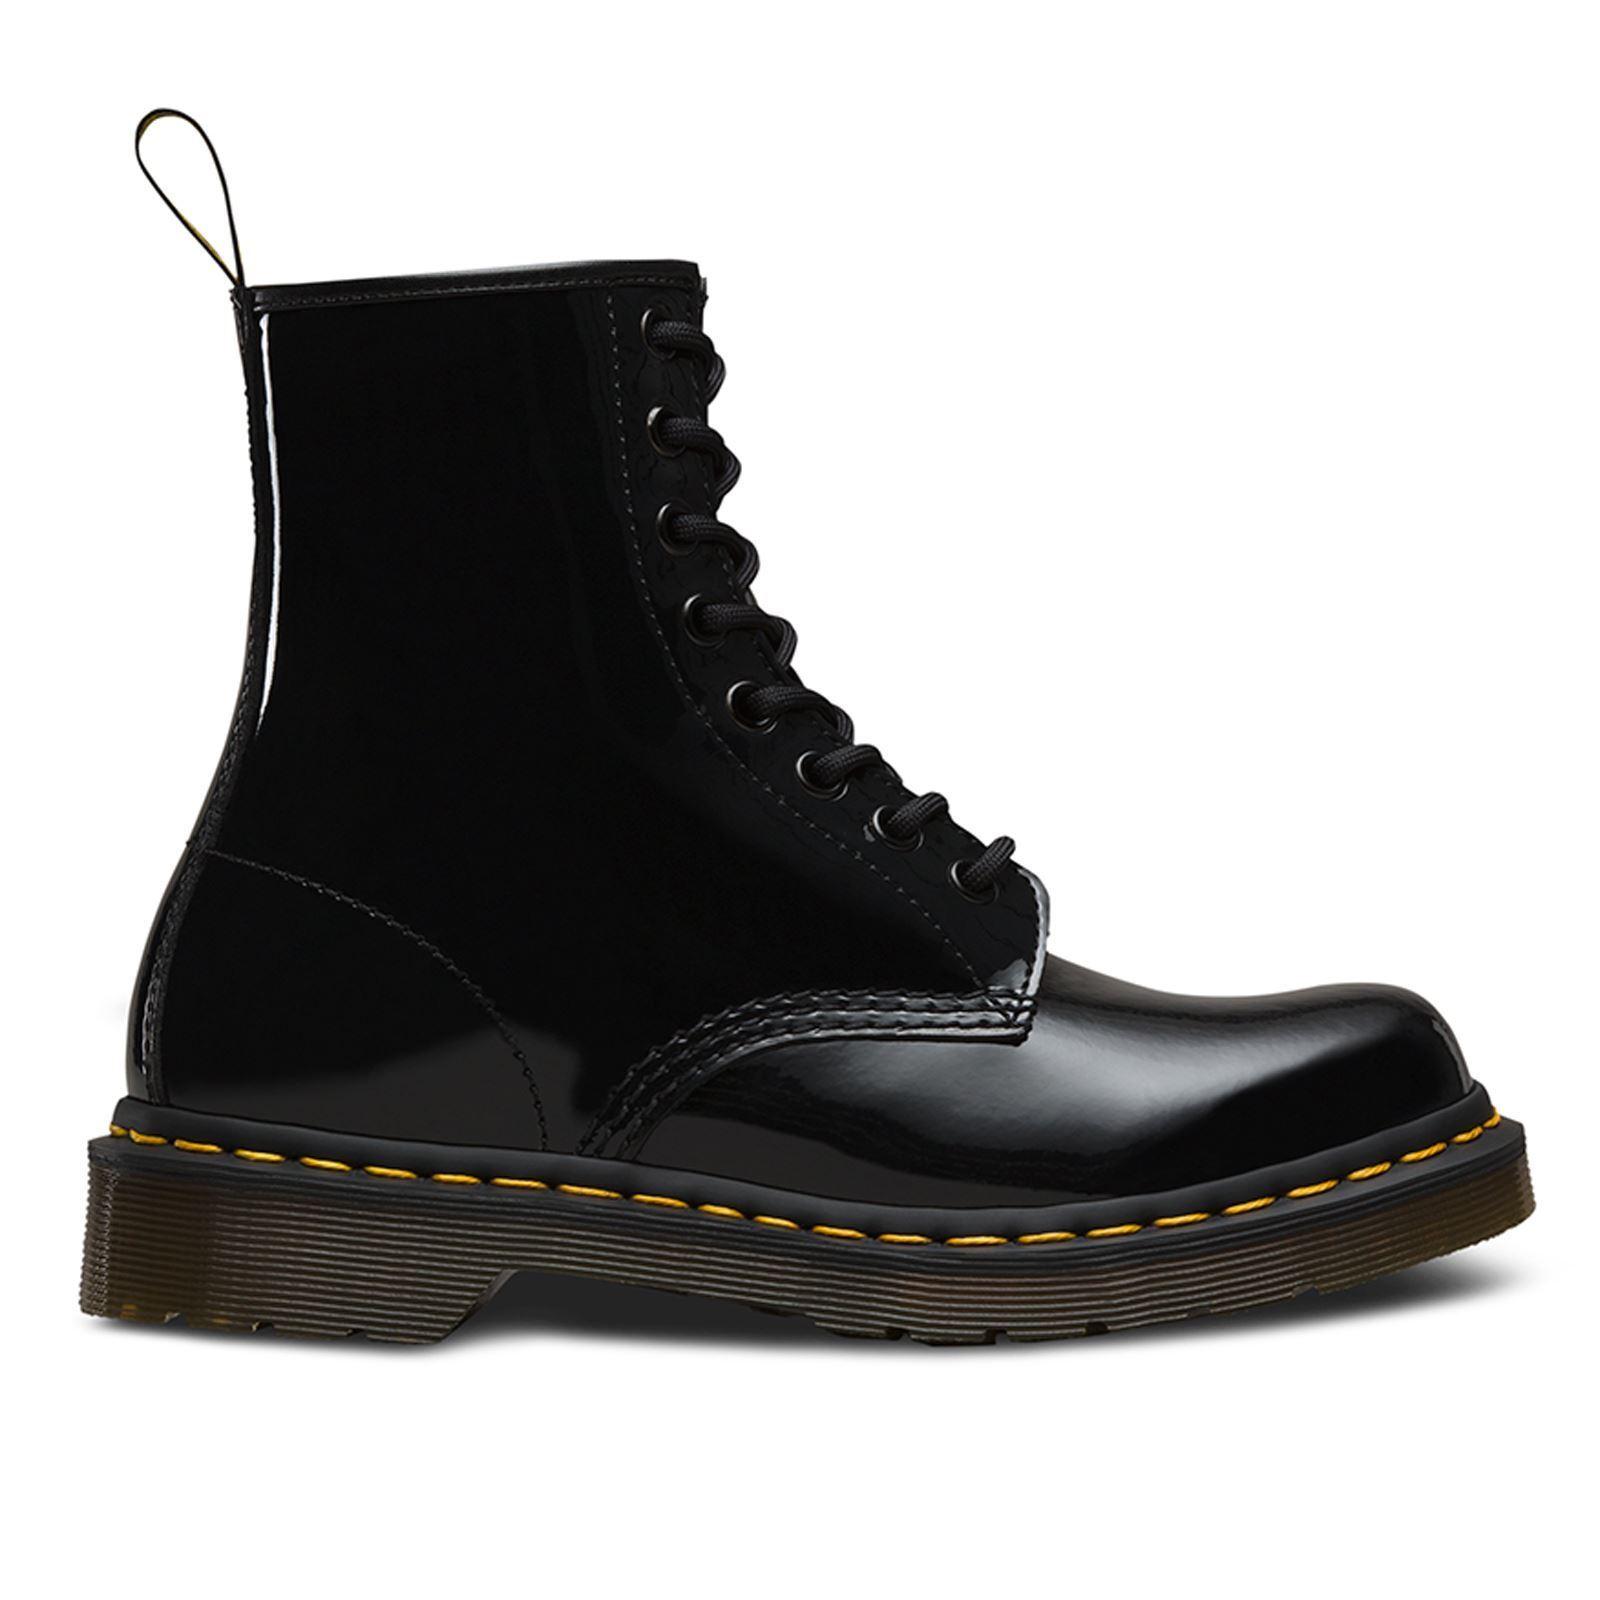 Dr. Martens 1460 Patente Lamper 8 Ojal Negro Patente botas para mujer